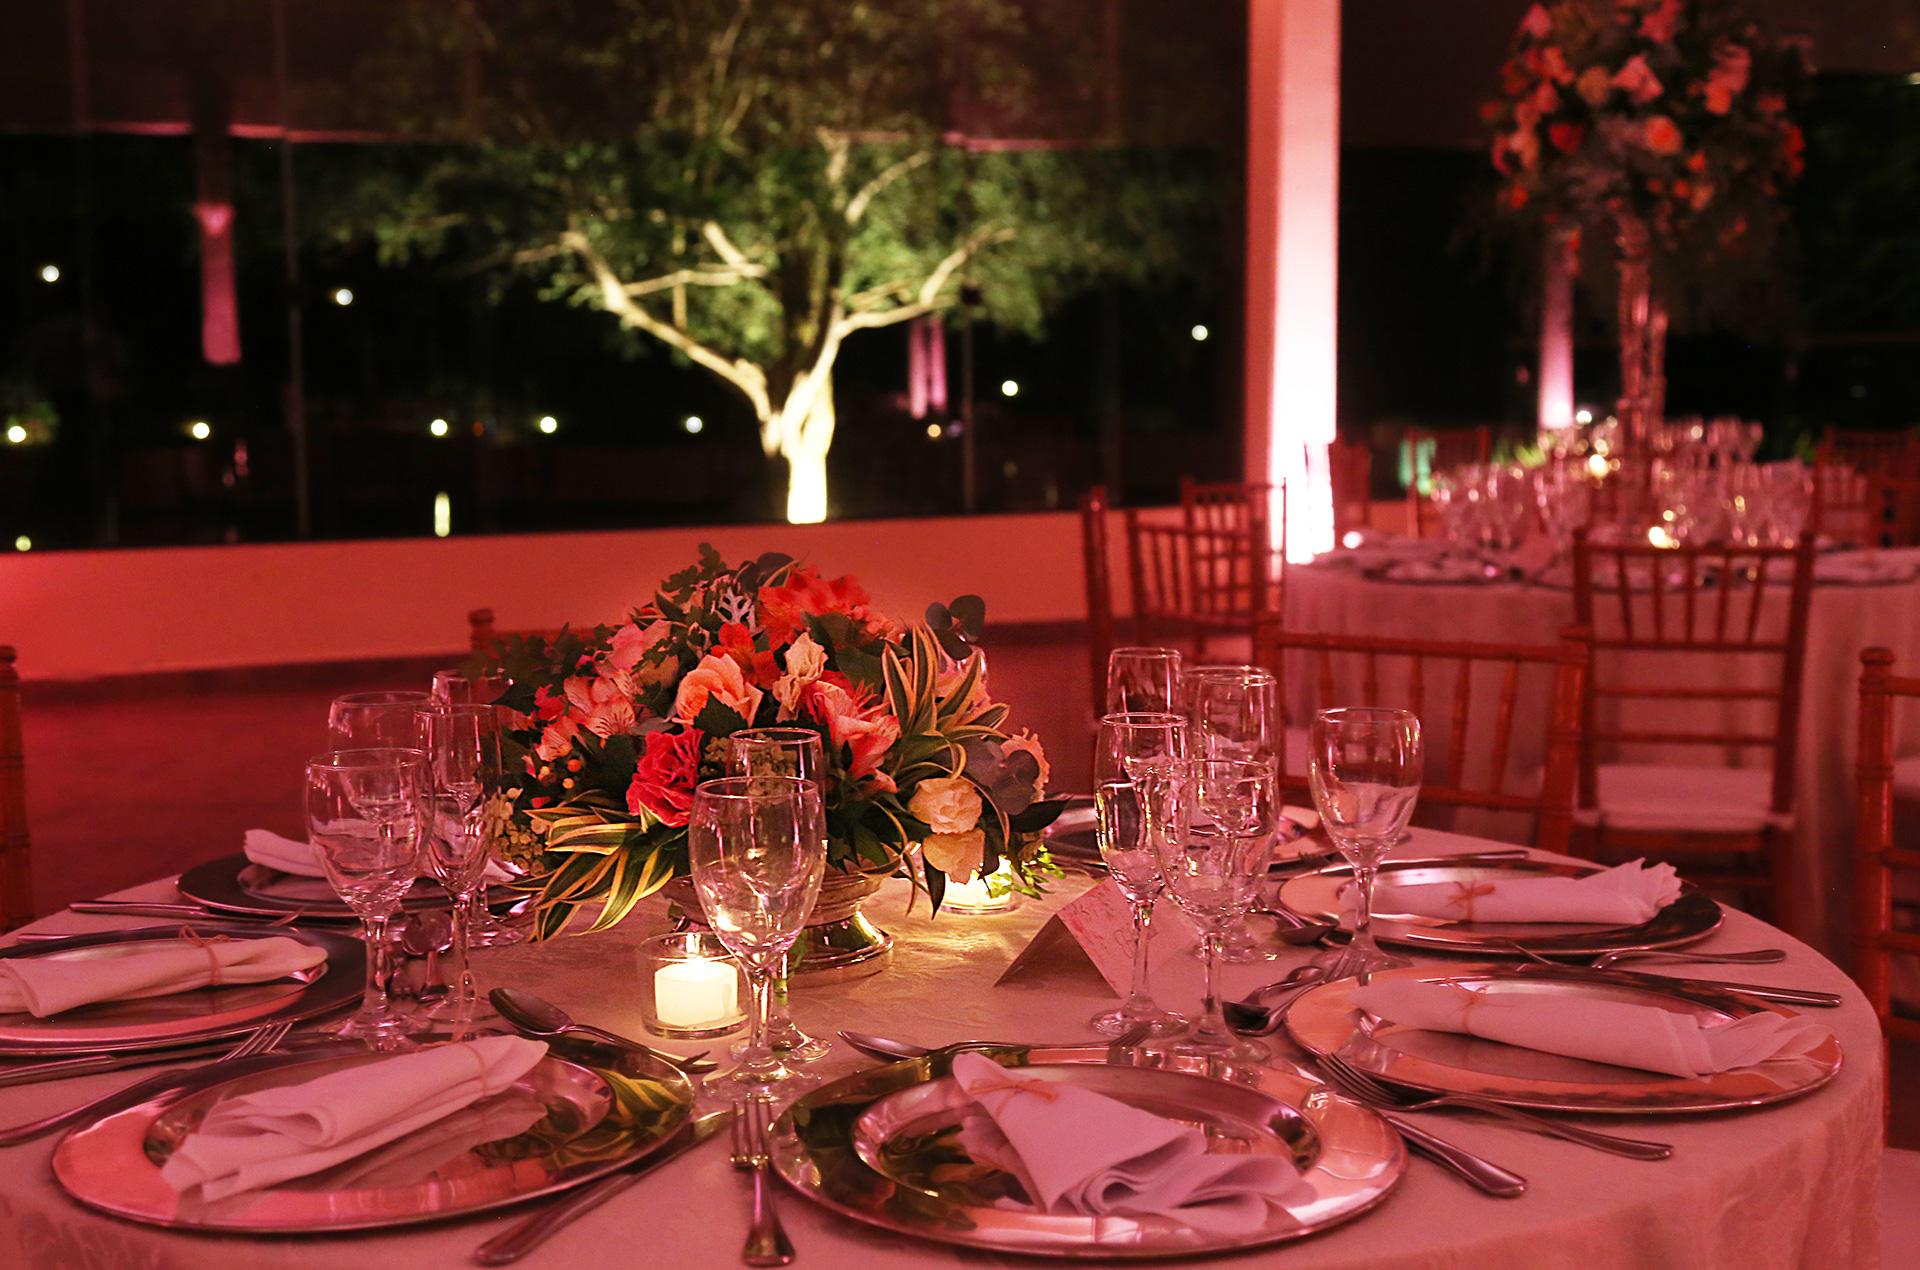 IMG_Hotel-Villa-Rossa-Sinfonia-das-Flores-Juba-Alves-Fotografia-sr-sp-115